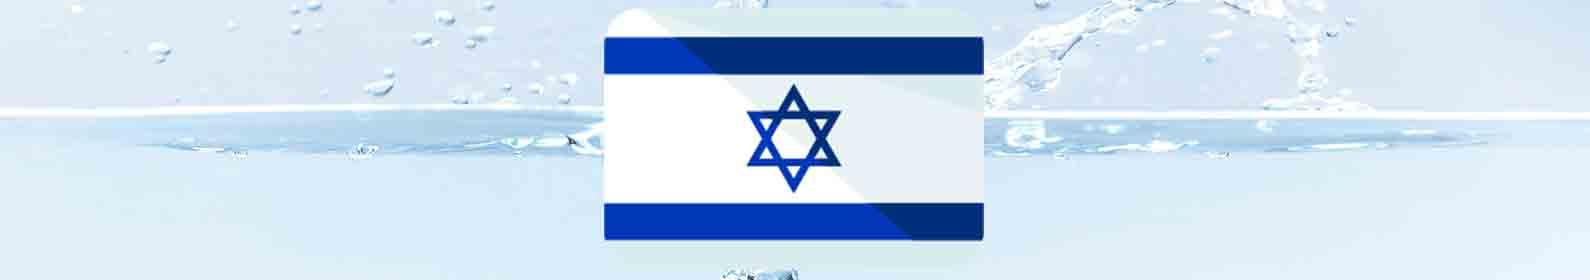 water-treatment-israel.jpg